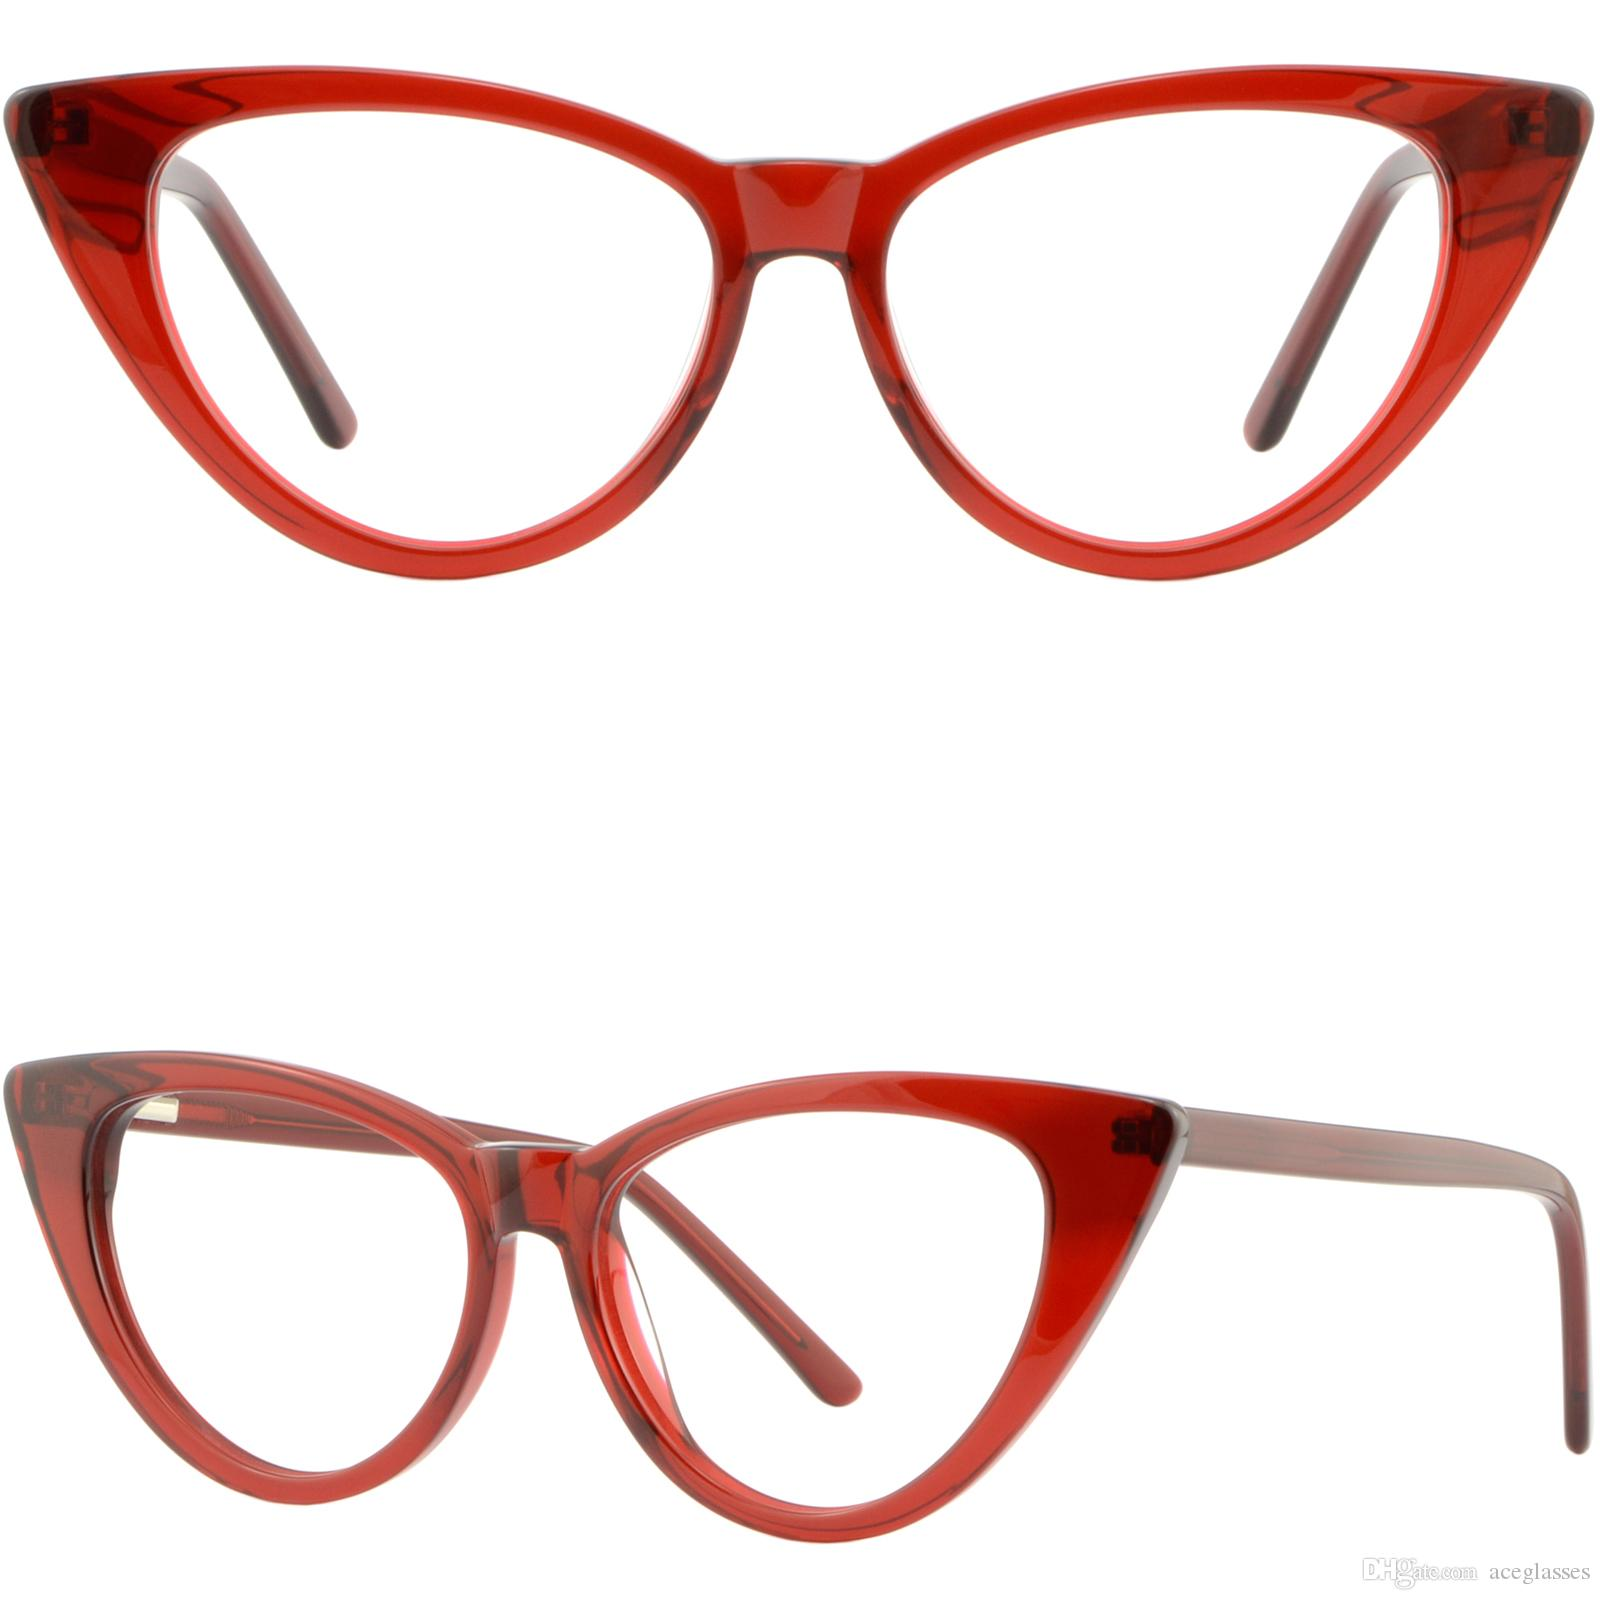 be91b8809fb Large Wide Womens Cat Eye Frame Plastic Spring Hinges RX Glasses  Translucent Red Choosing Eyeglass Frames Coastal Frames From Aceglasses